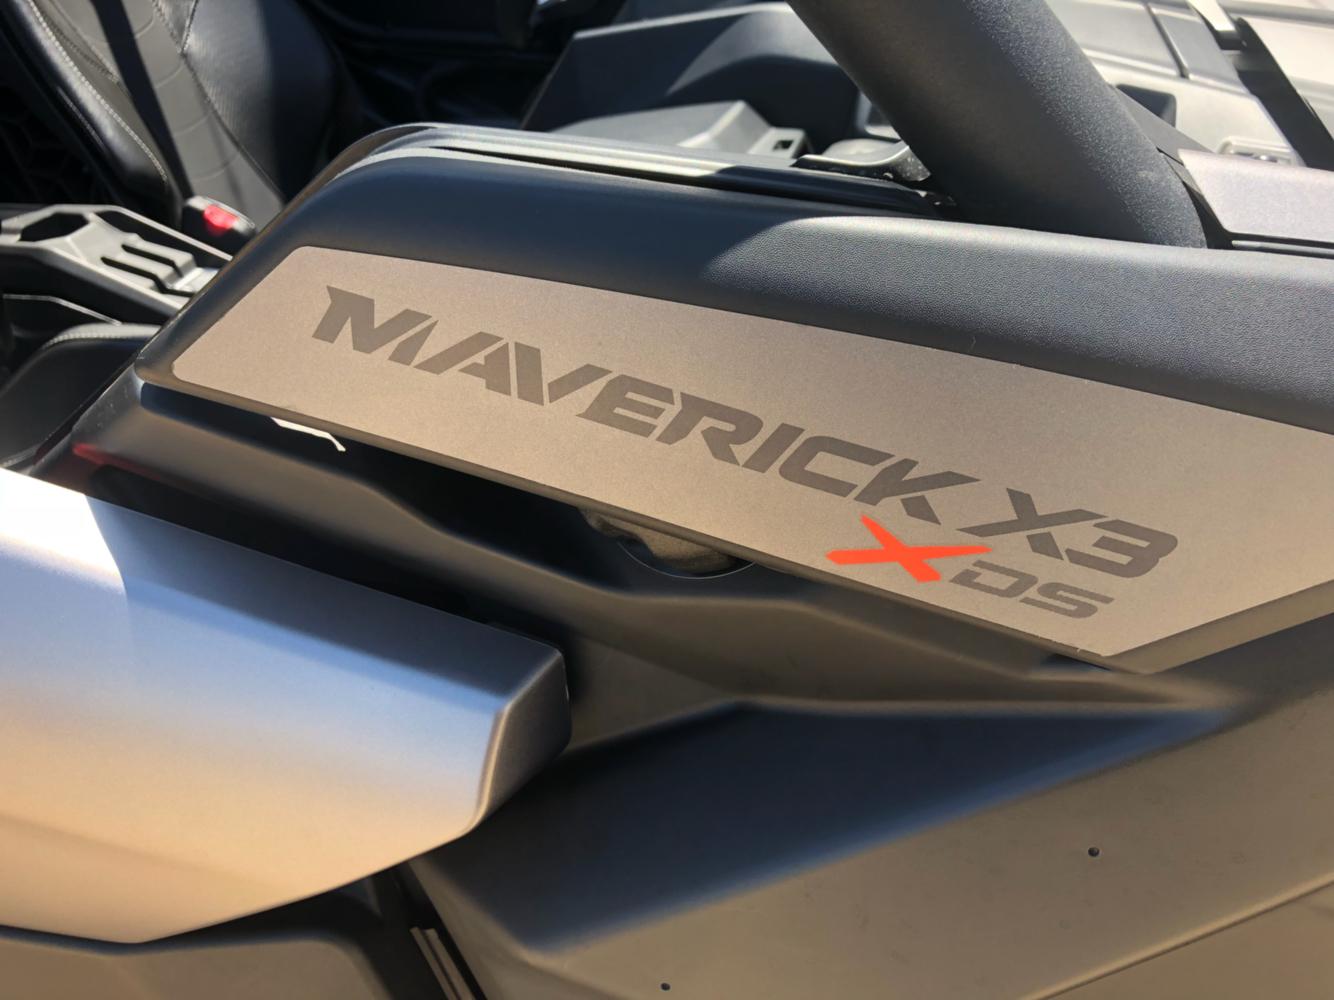 2018 Can-Am™ Maverick X3 X ds Turbo R 5